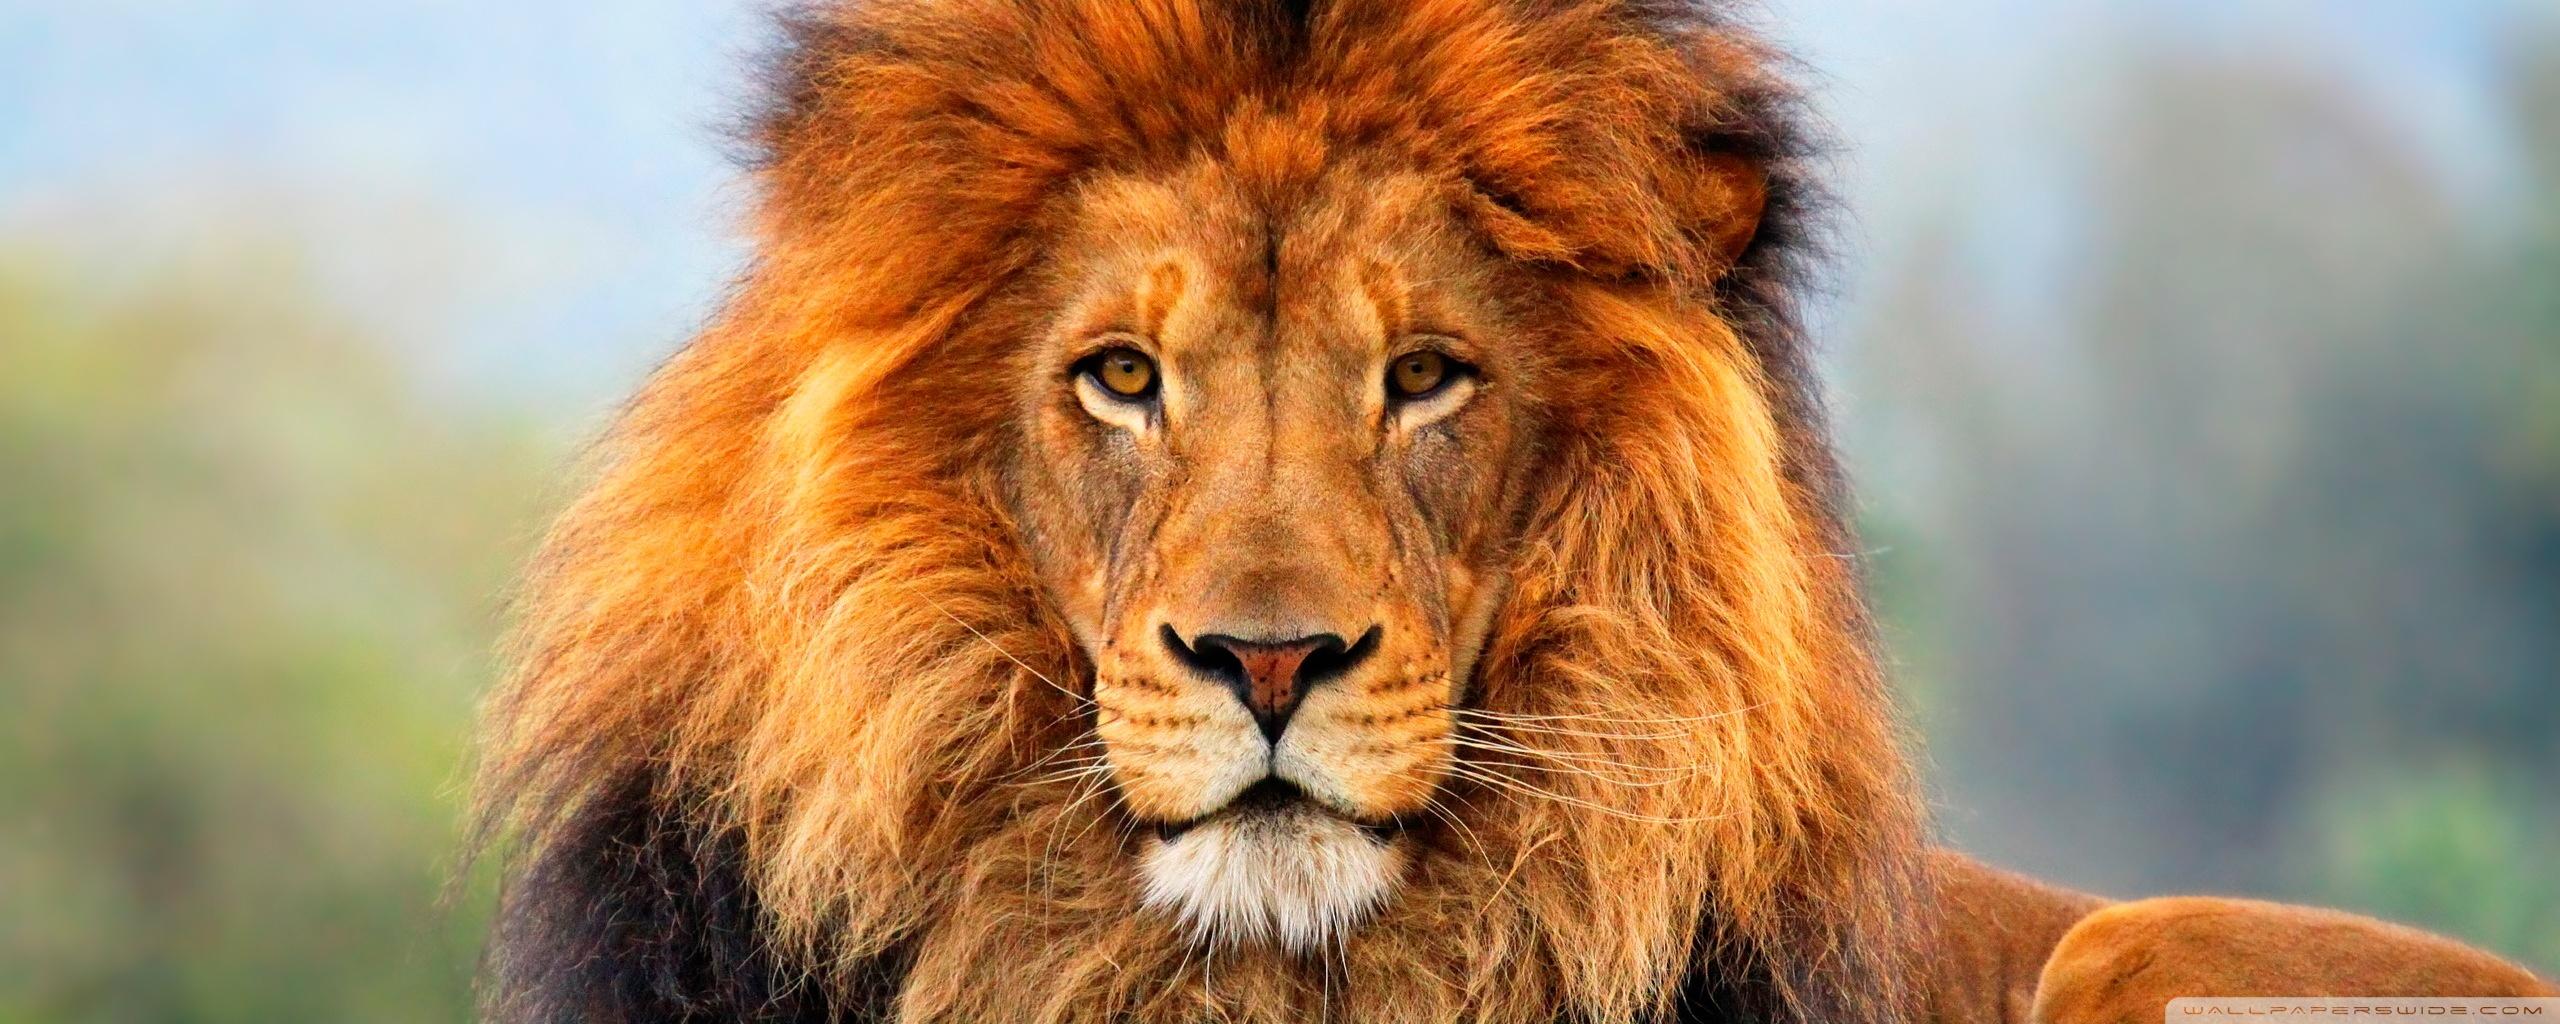 52 Lion Desktop Wallpaper On Wallpapersafari